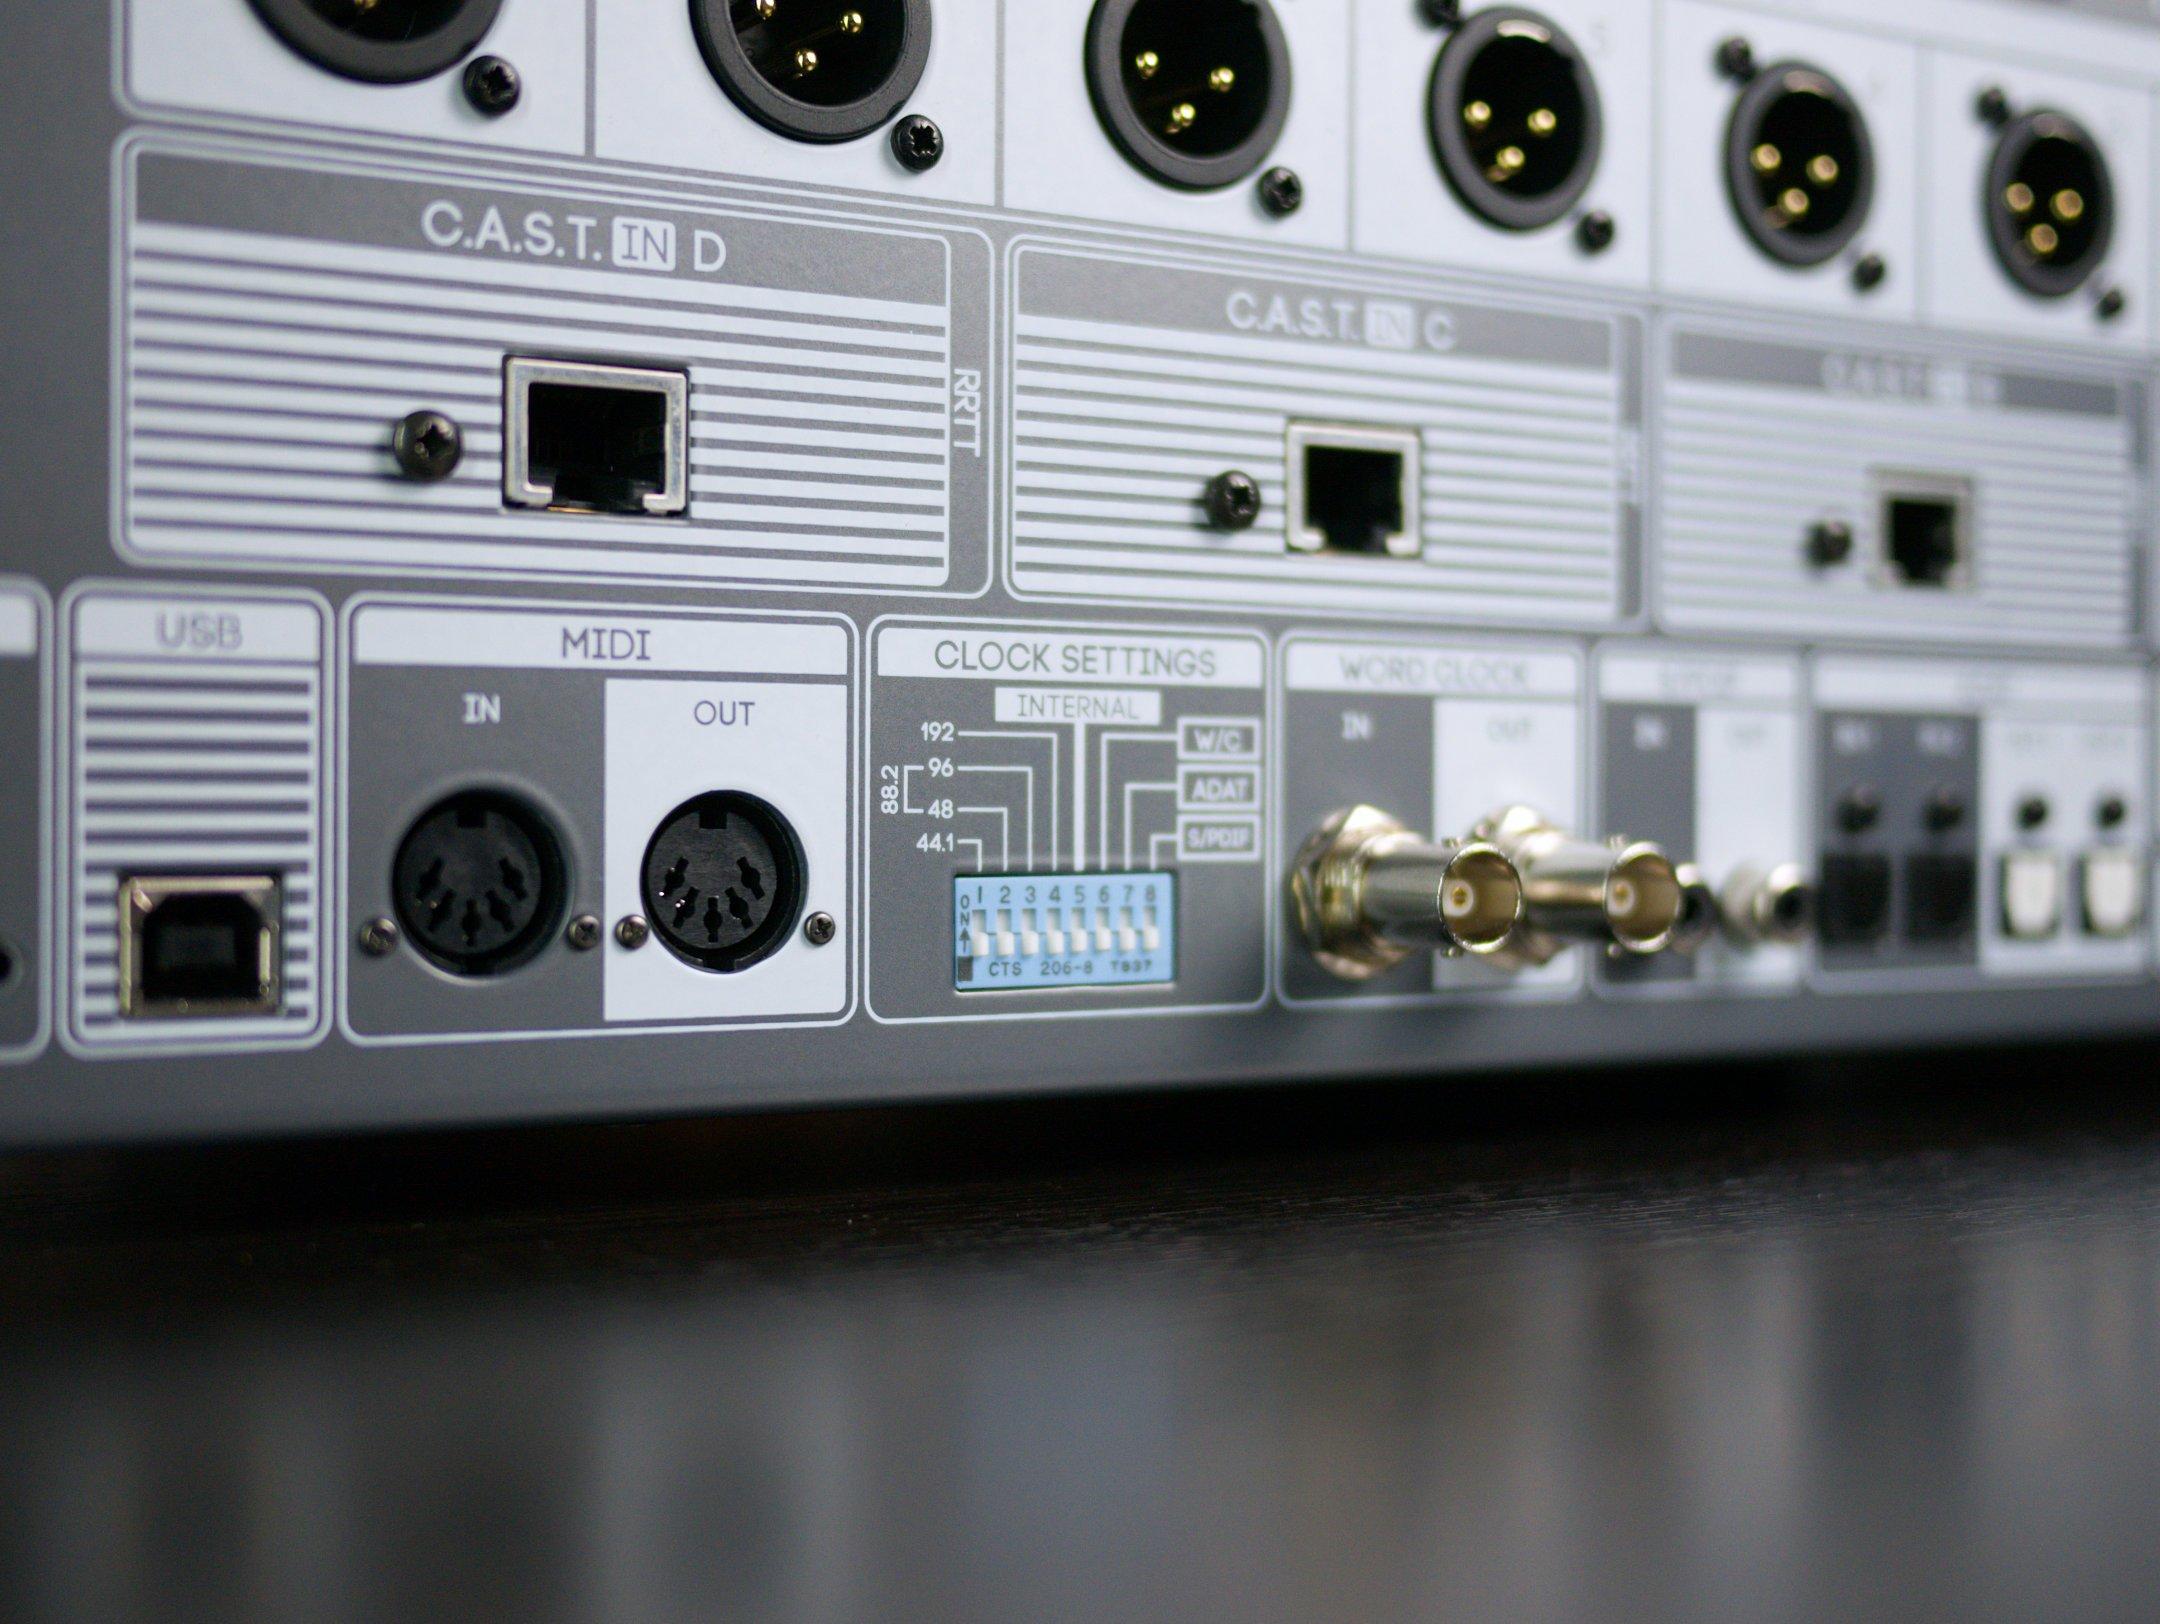 R8_Rear_USB_72dpi_JPG